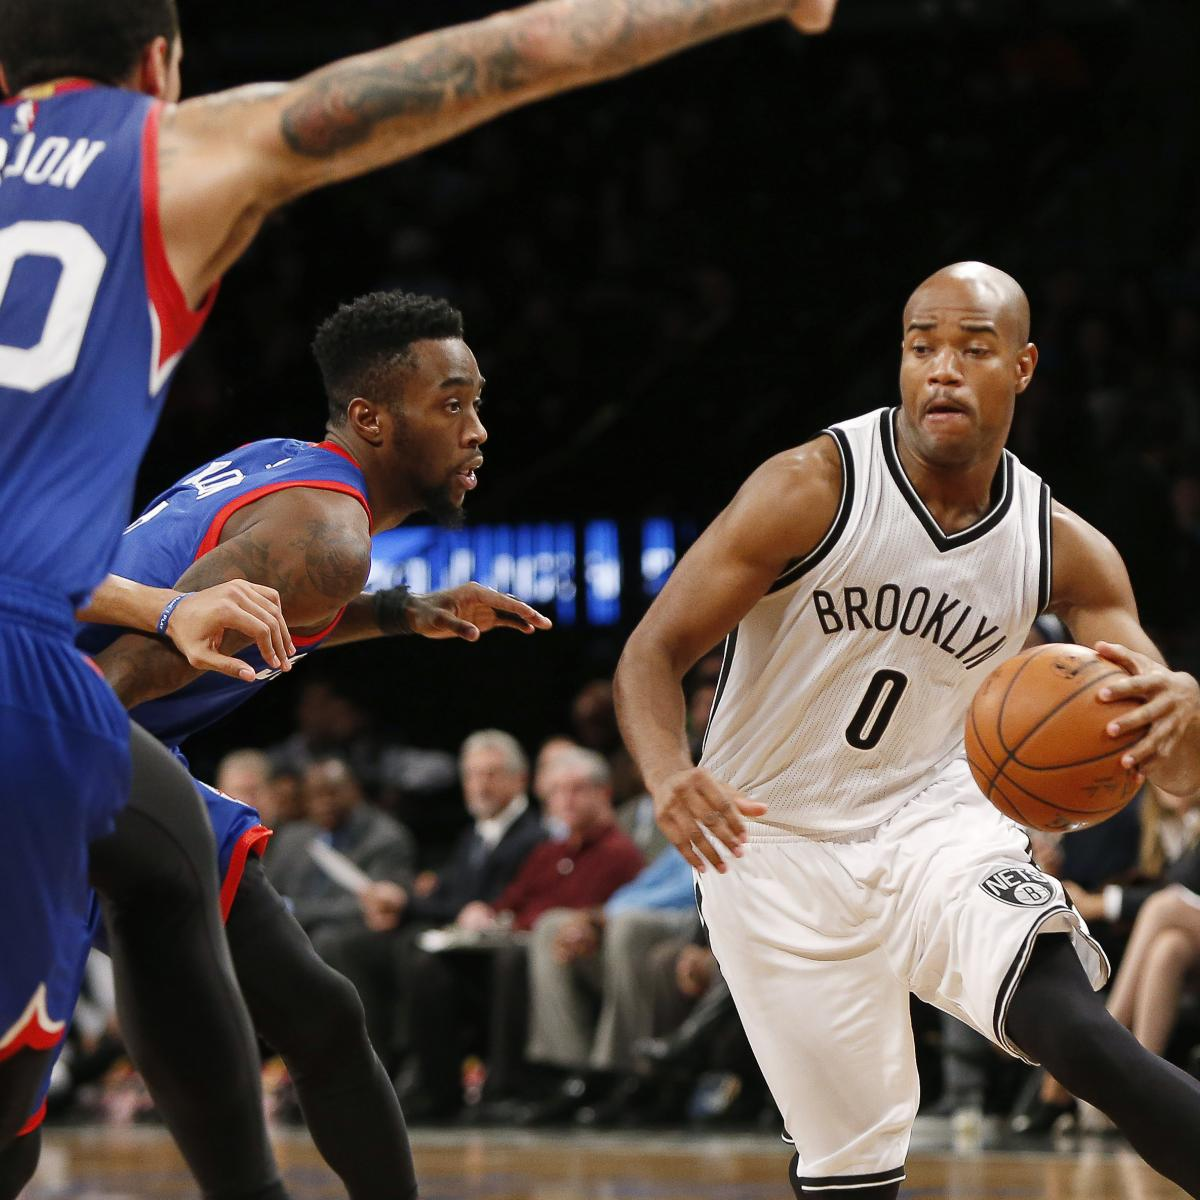 Warriors Vs Nets Full Game Highlights: Philadelphia 76ers Vs. Brooklyn Nets 10/20/14: Video